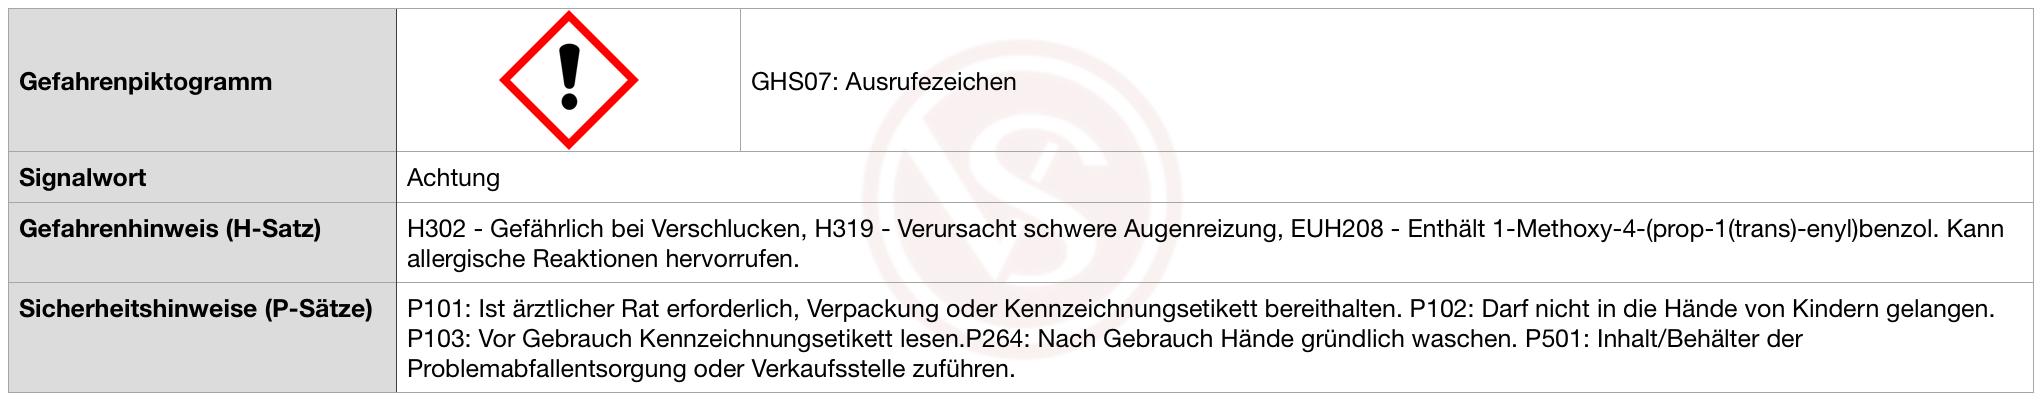 H302_H319_EUH208_1-methoxy_GHF_Achtung